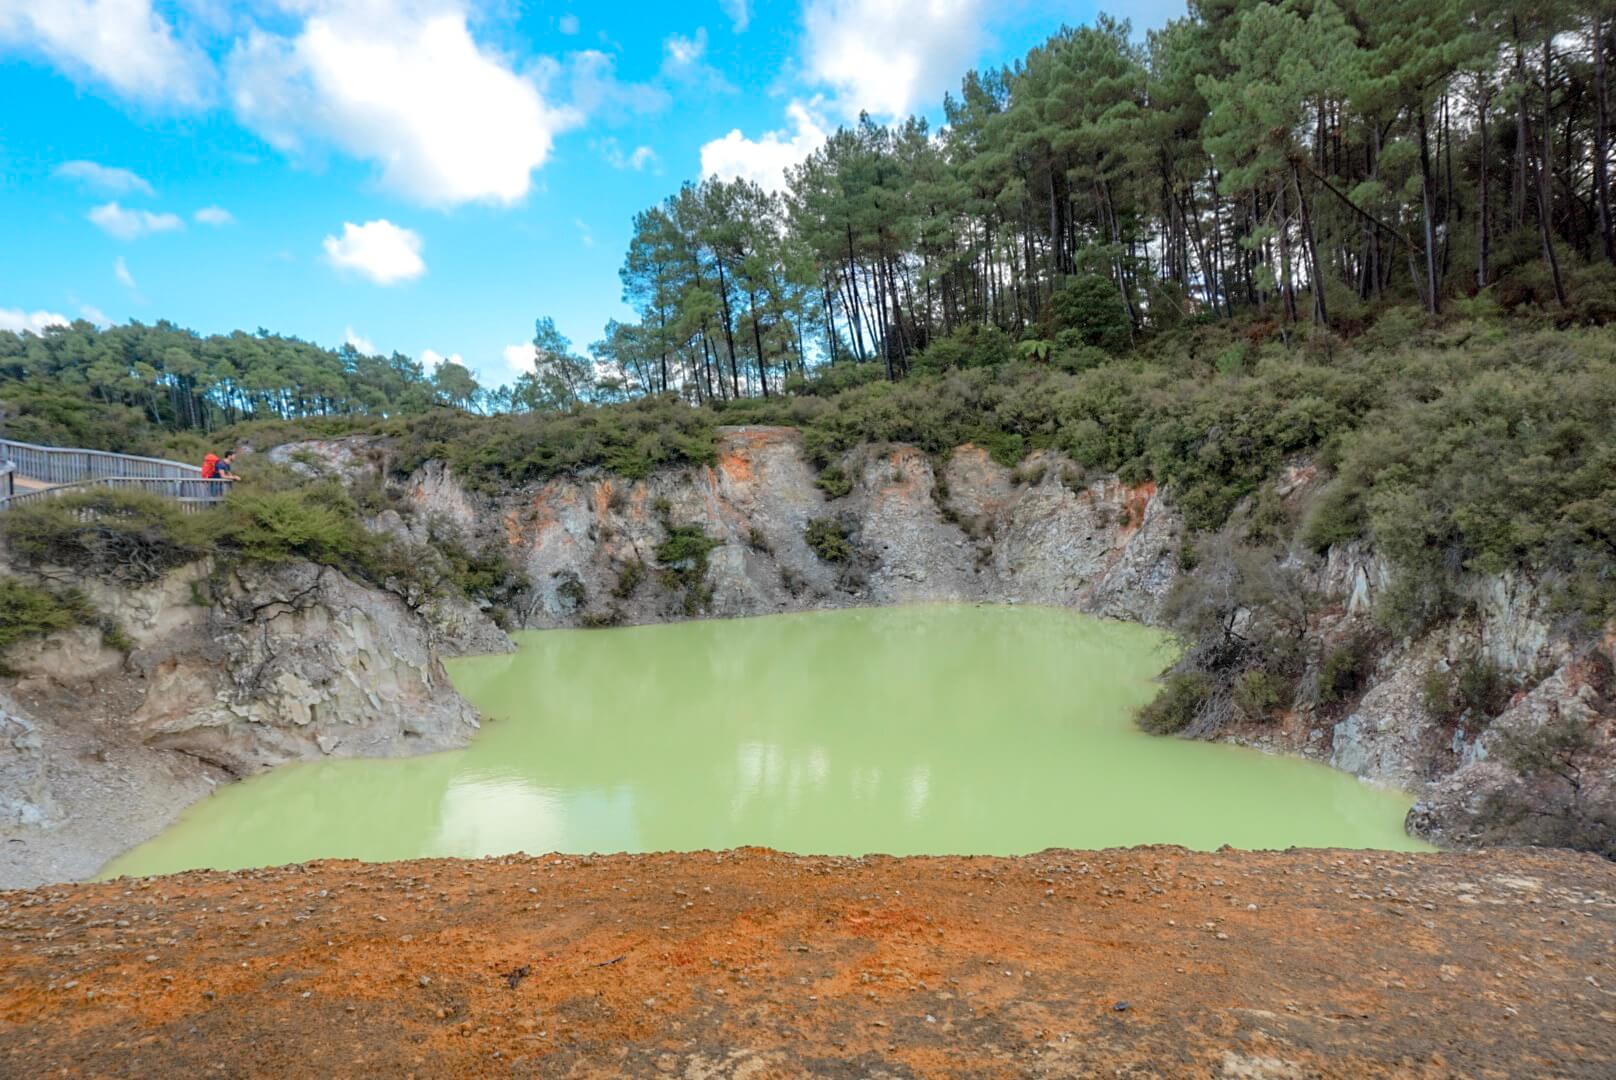 Le bassin vert fluo devil bath wai-o-tapu